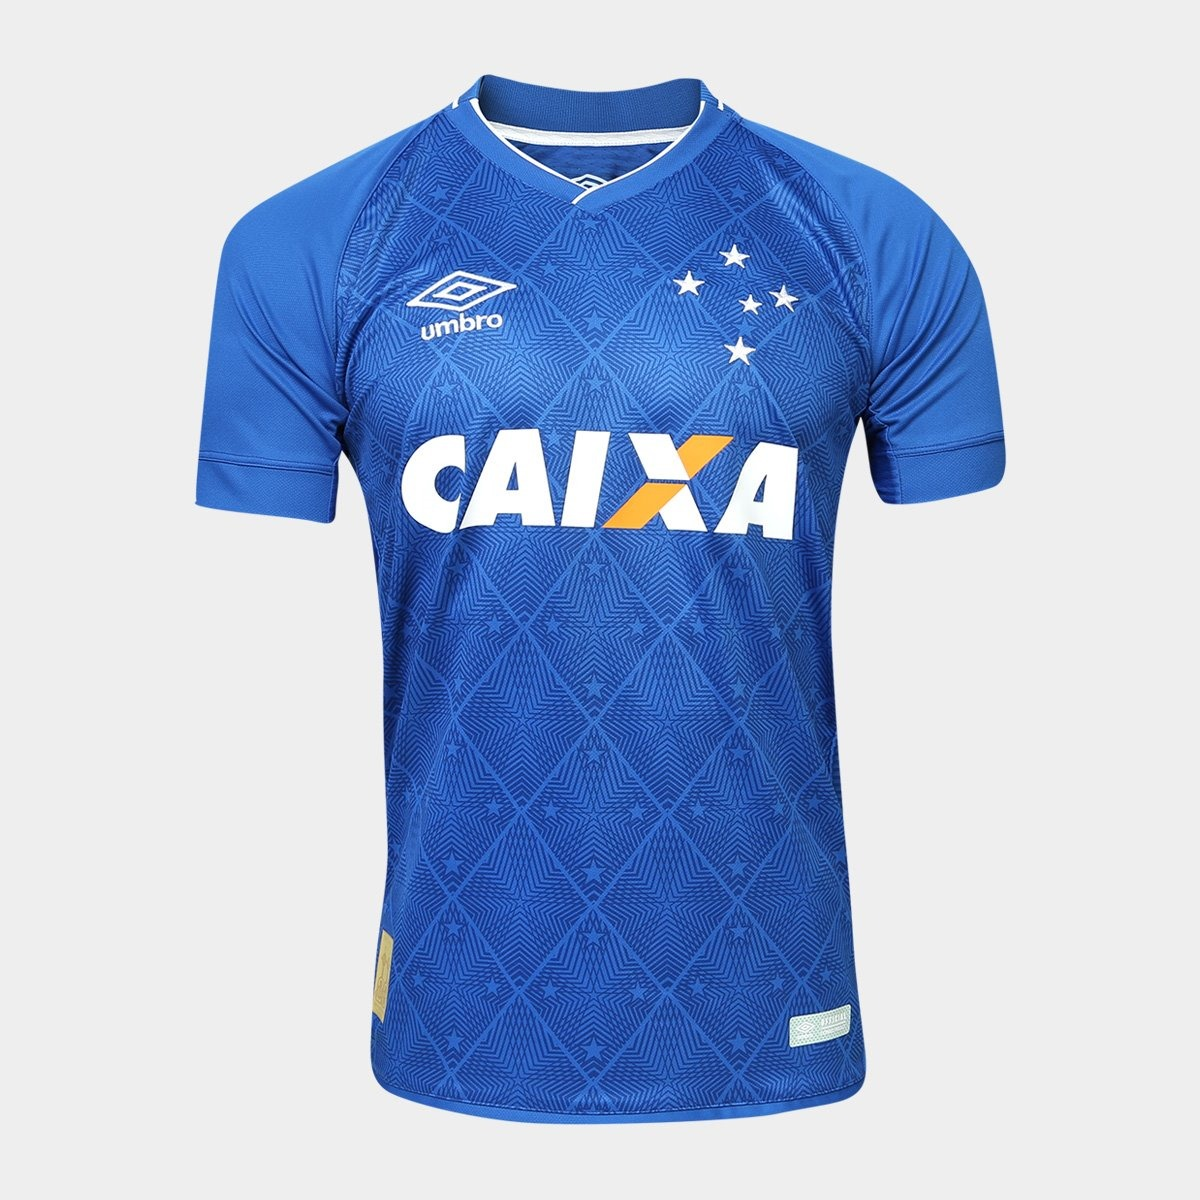 55fa21aacb camisa cruzeiro esporte clube 2017-2018 azul masculina. Carregando zoom.